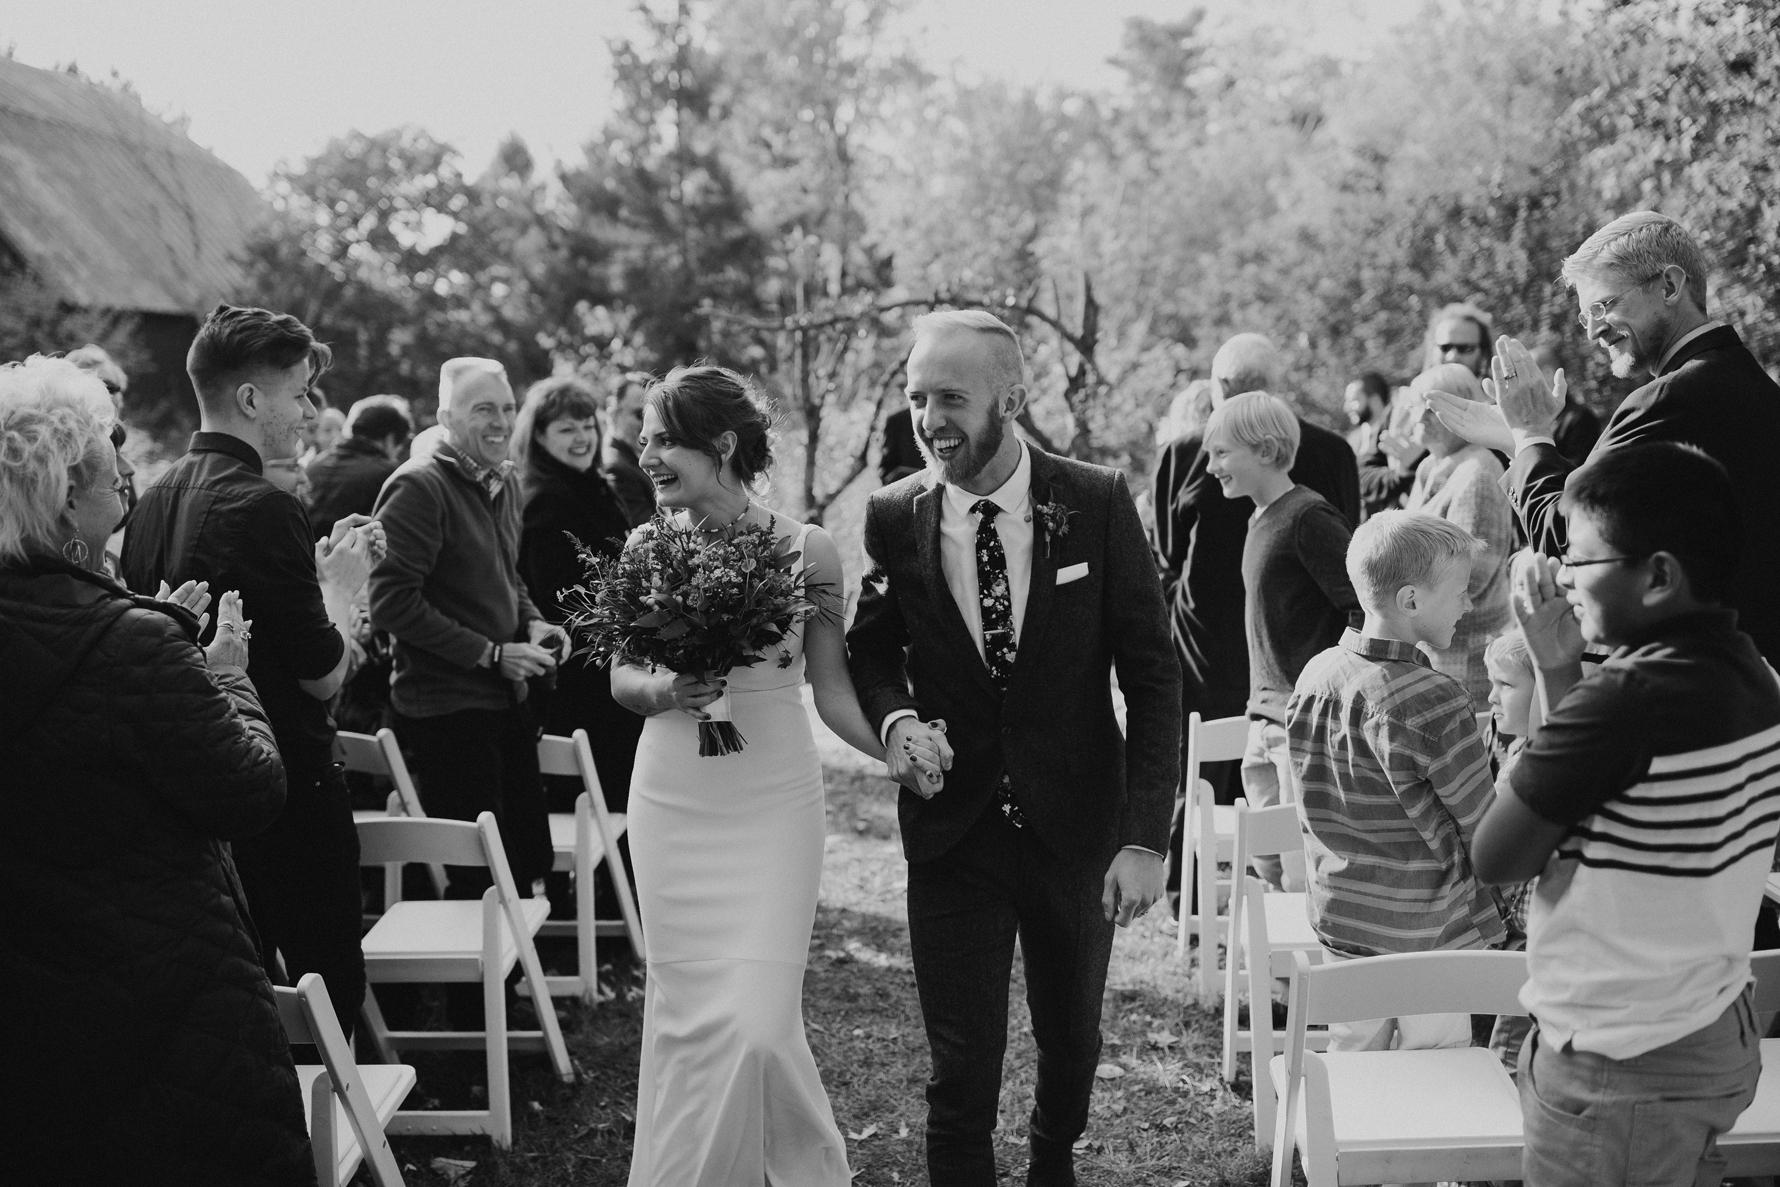 norris-traverse-city-wedding-51.JPG